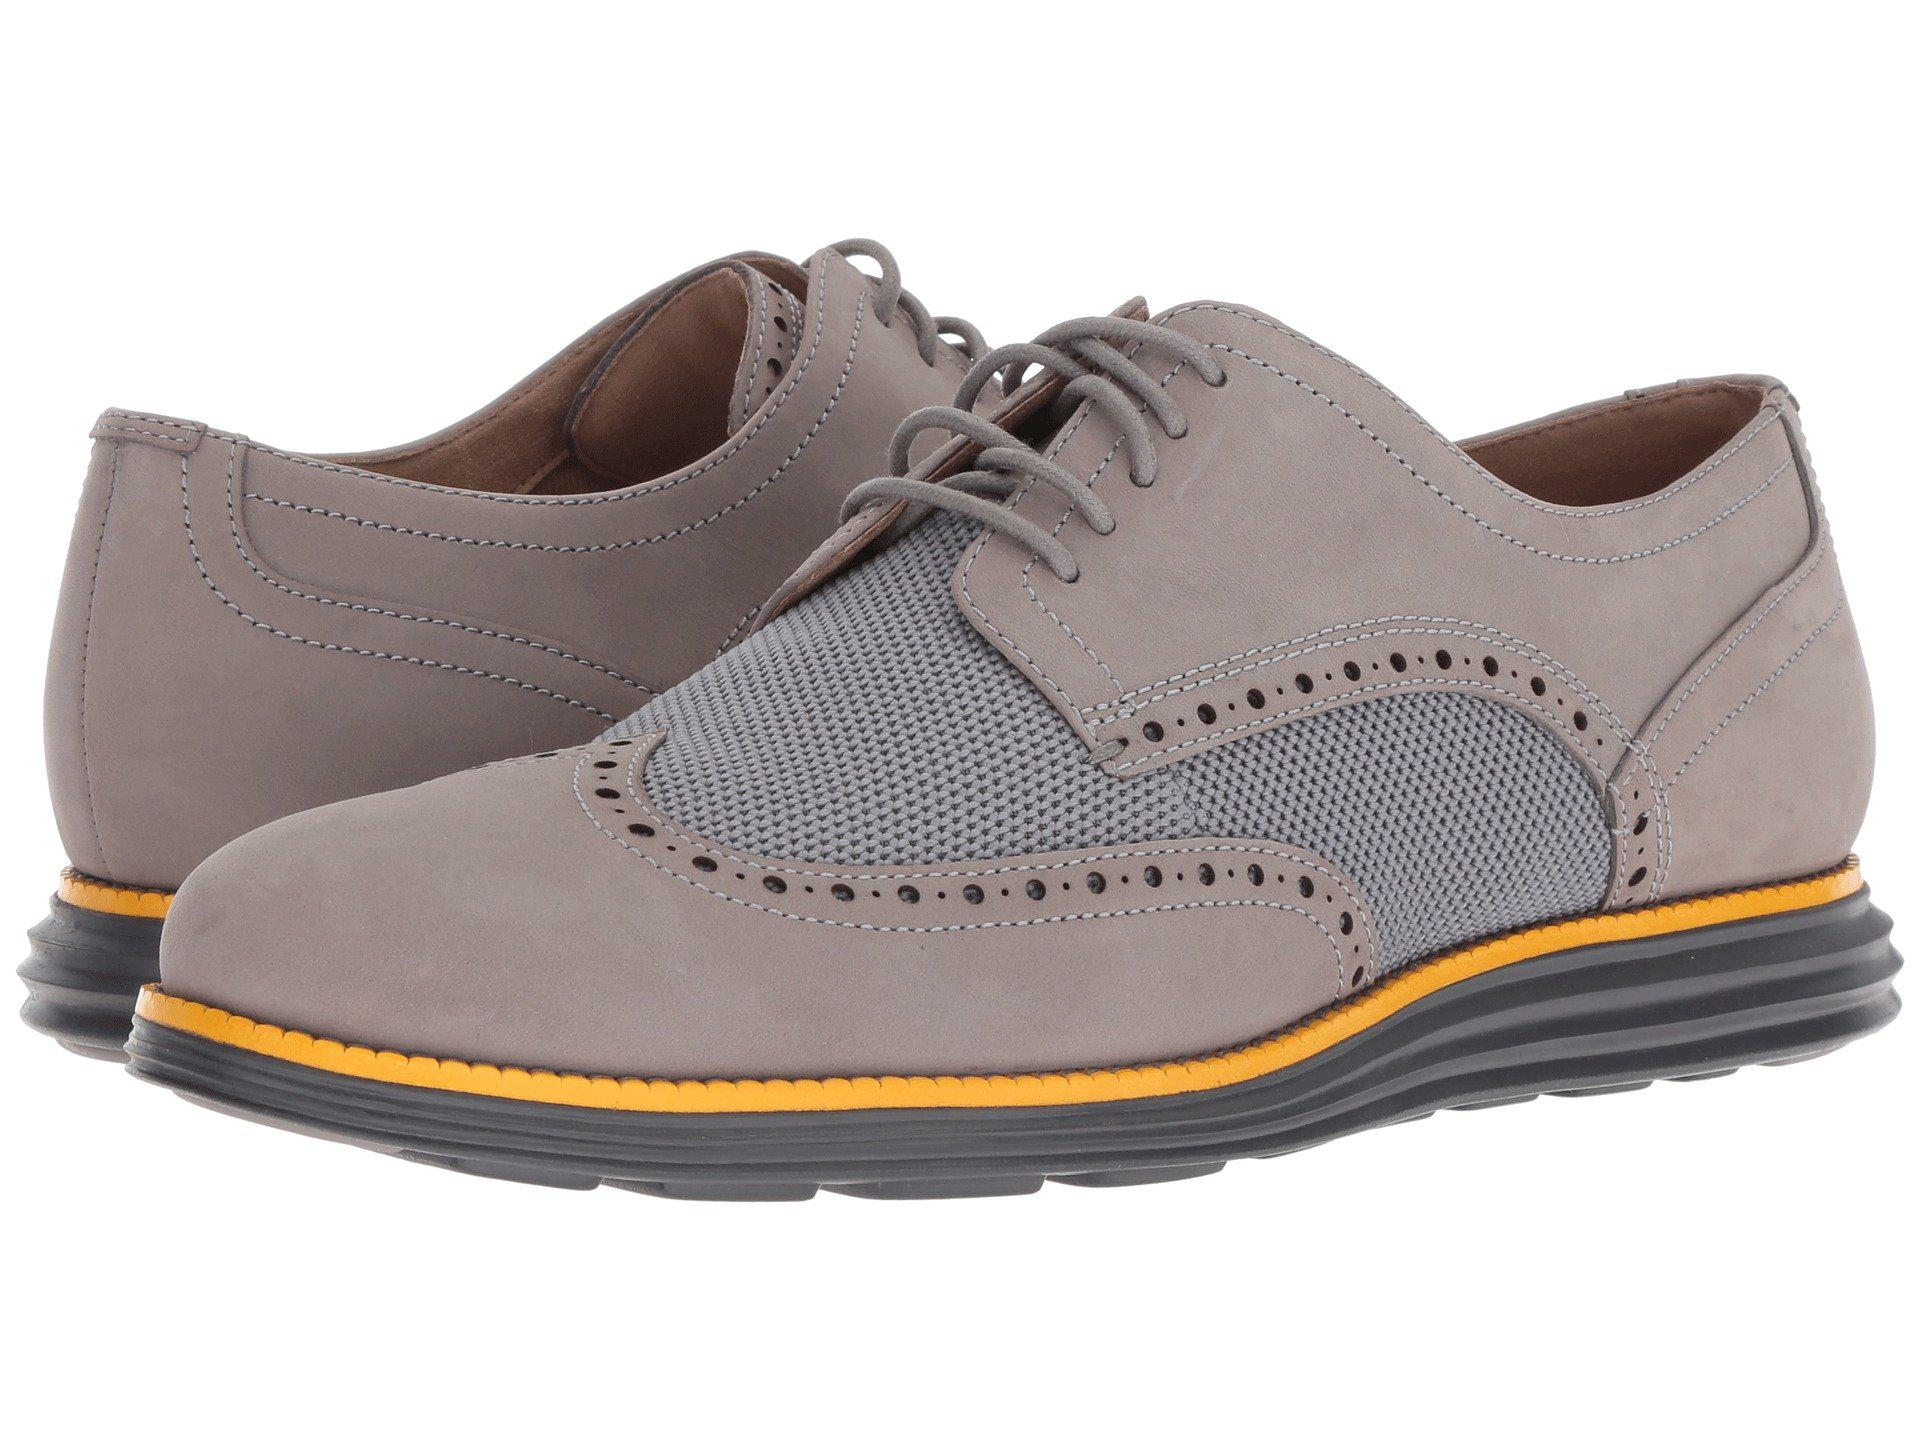 41b8f30d4f369f Lyst - Cole Haan Original Grand Wingtip Oxford (magnet grey Wool ...